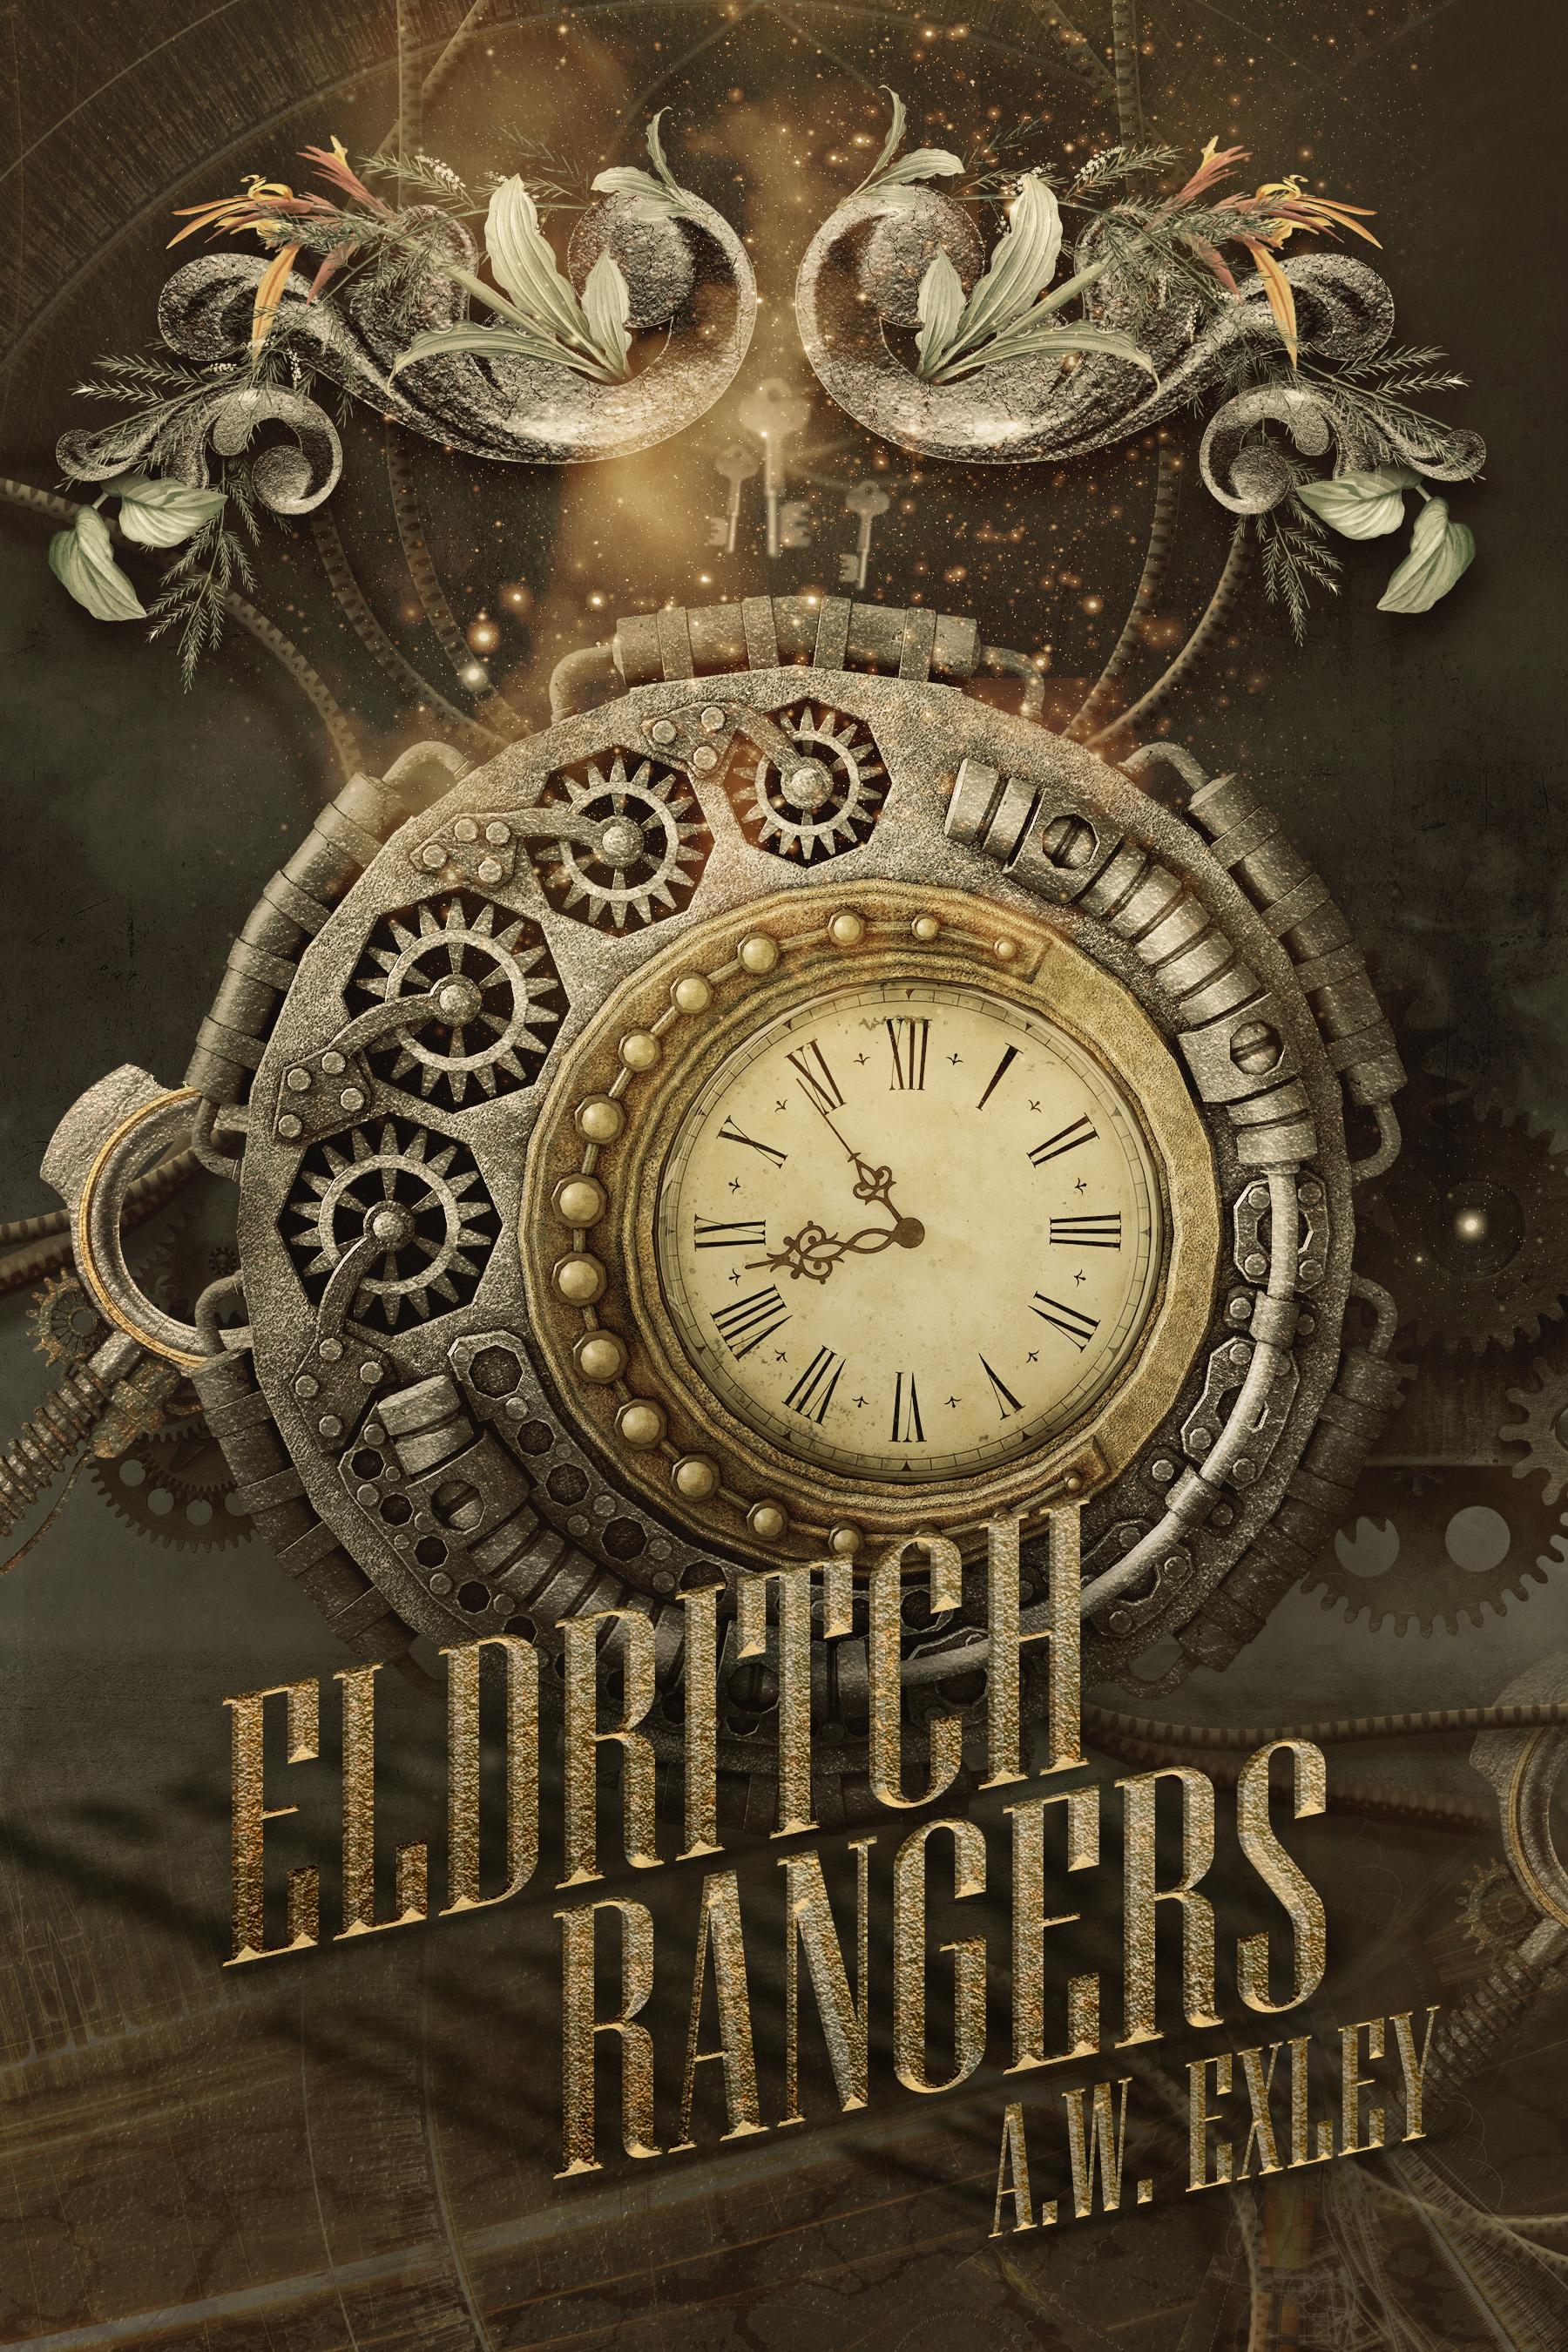 Eldritch Rangers